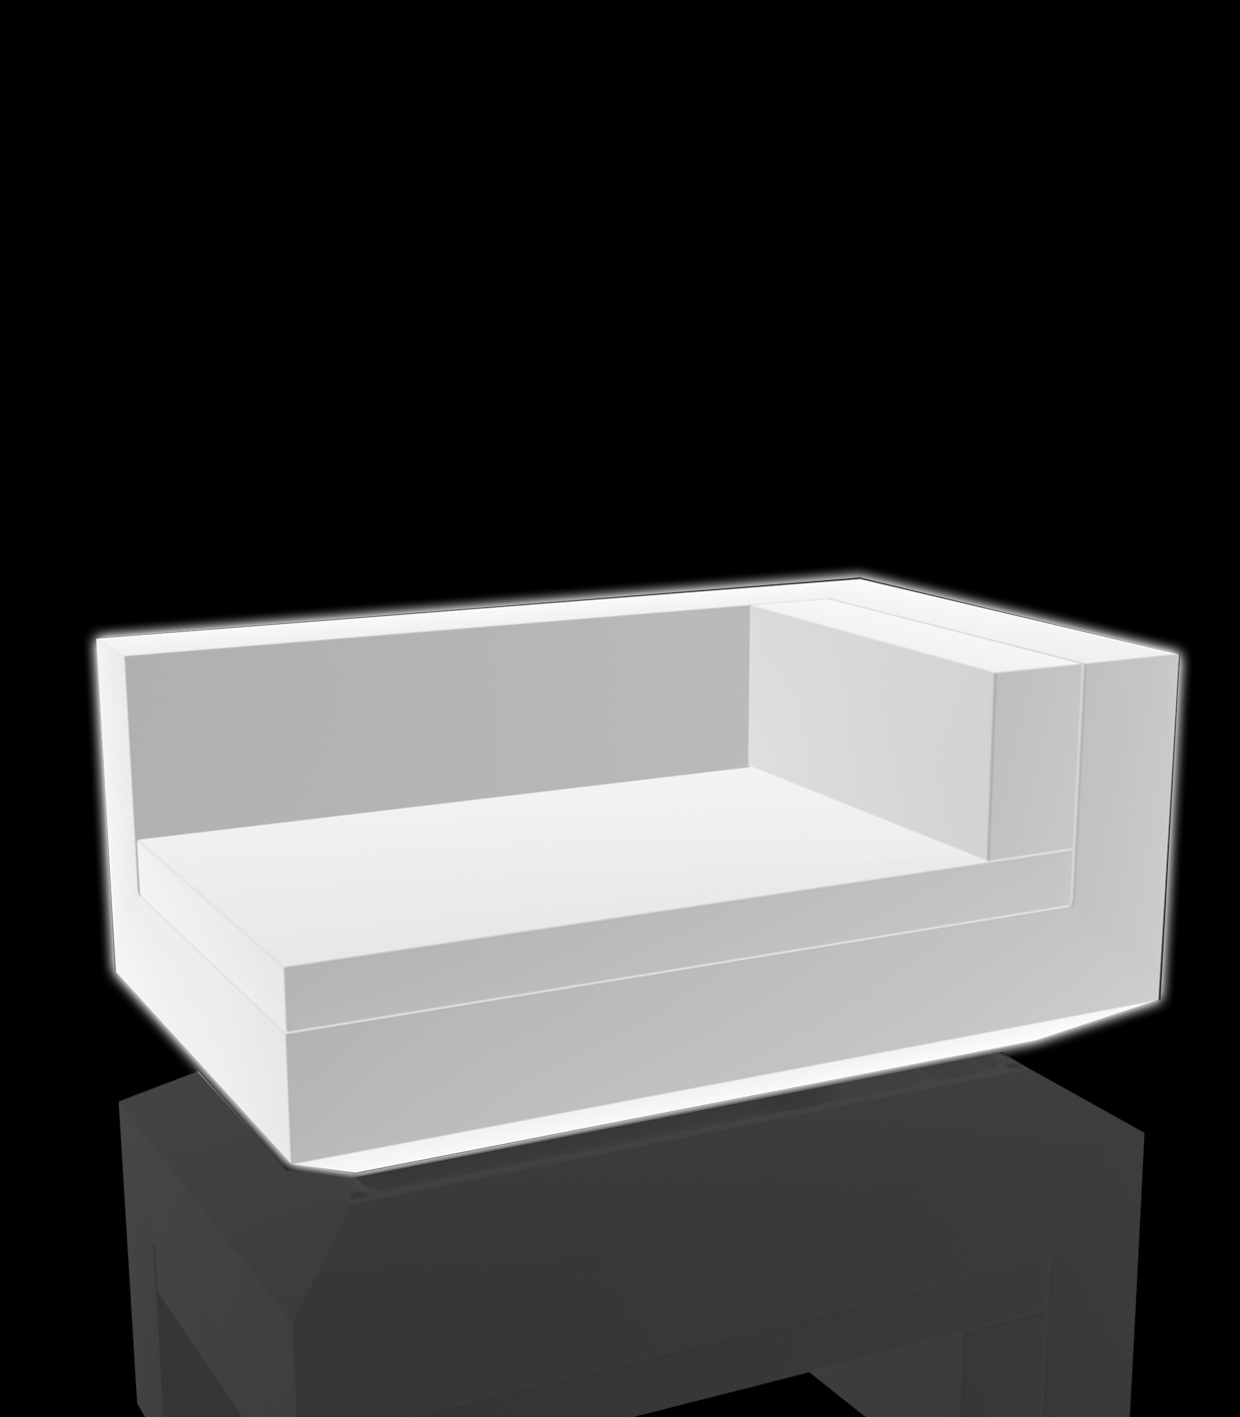 white lighting deck chair right adjustable vela sofa by vondom. Black Bedroom Furniture Sets. Home Design Ideas